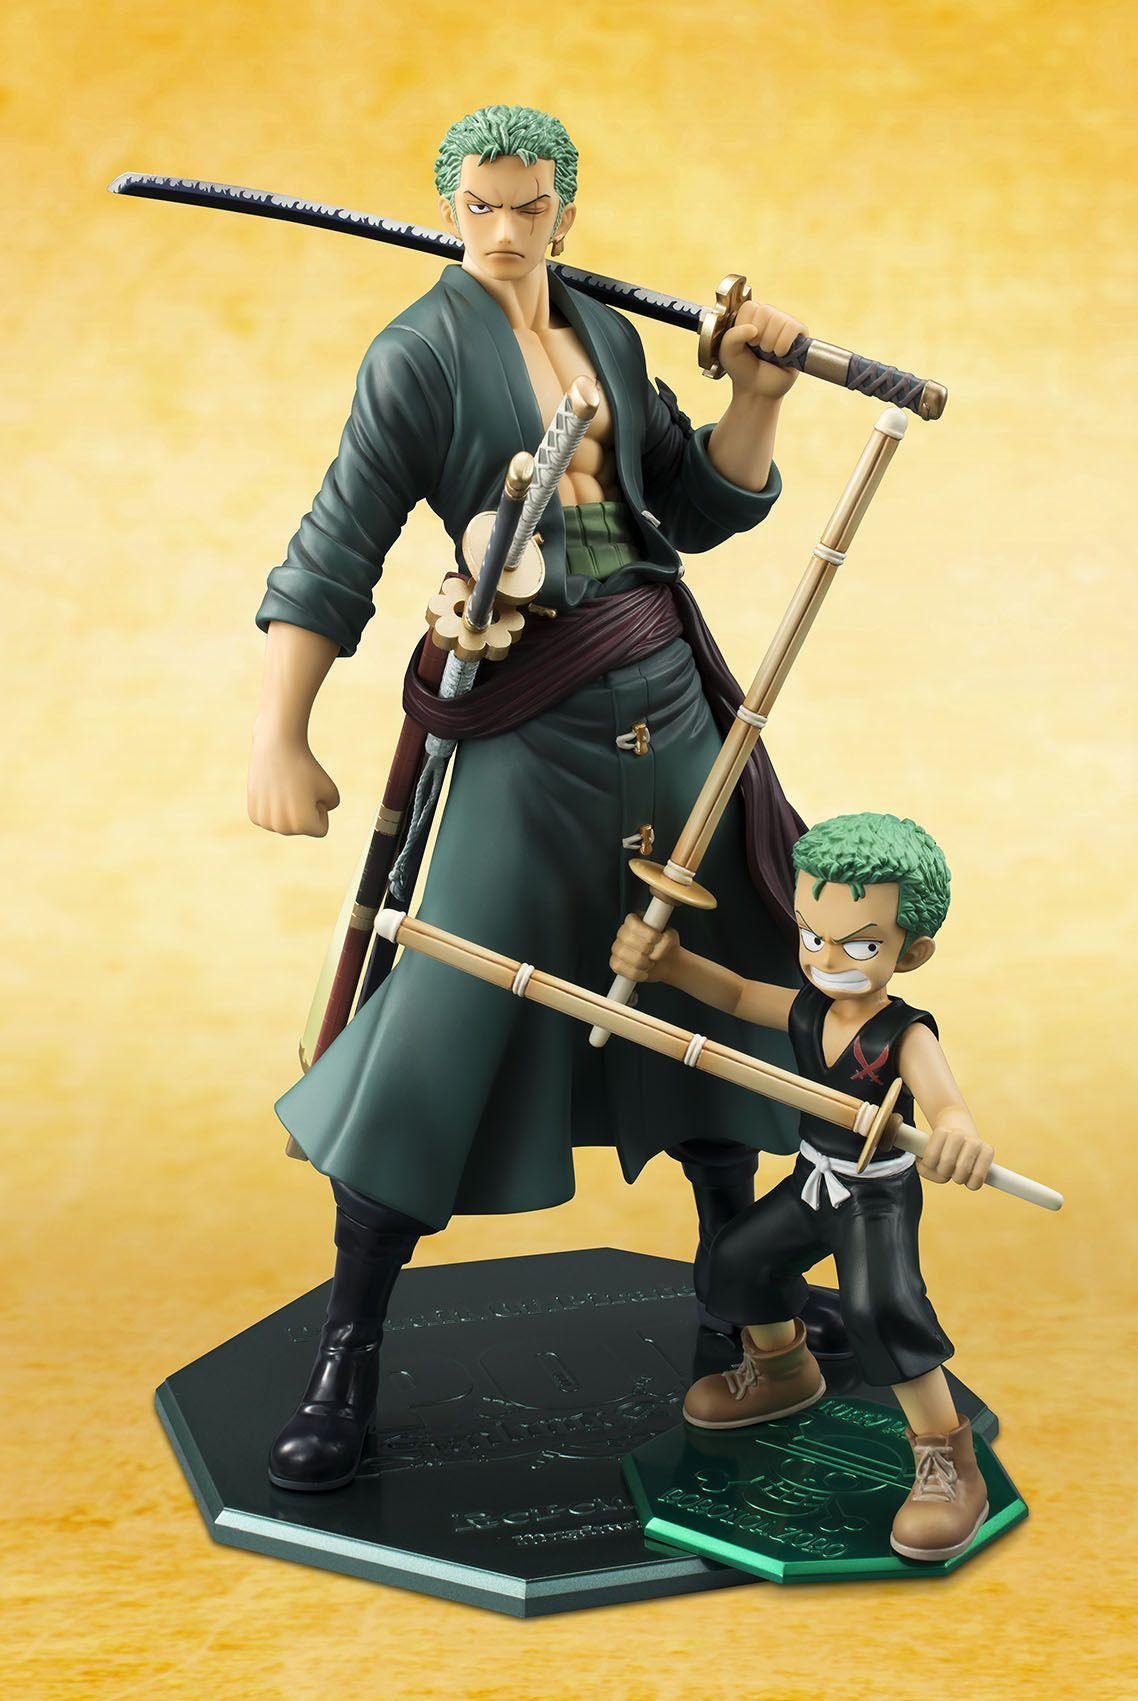 Anime One Piece Jouets Roronoa Zoro Collectible Figures Figurines Statues 13cm